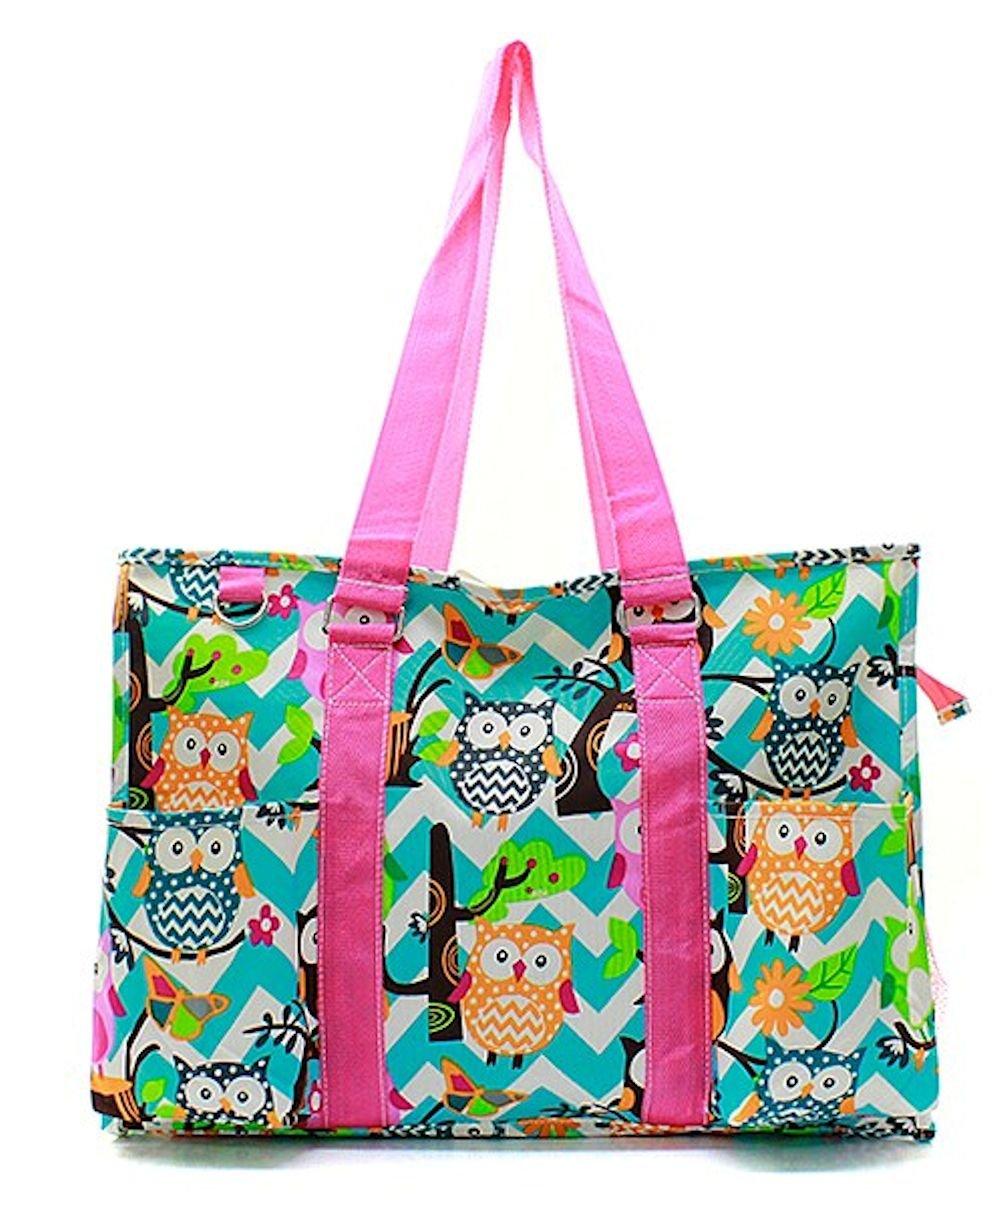 N. Gil All Purpose Organizer 18'' Large Utility Tote Bag (Chevron Owl Aqua/Hot Pink)